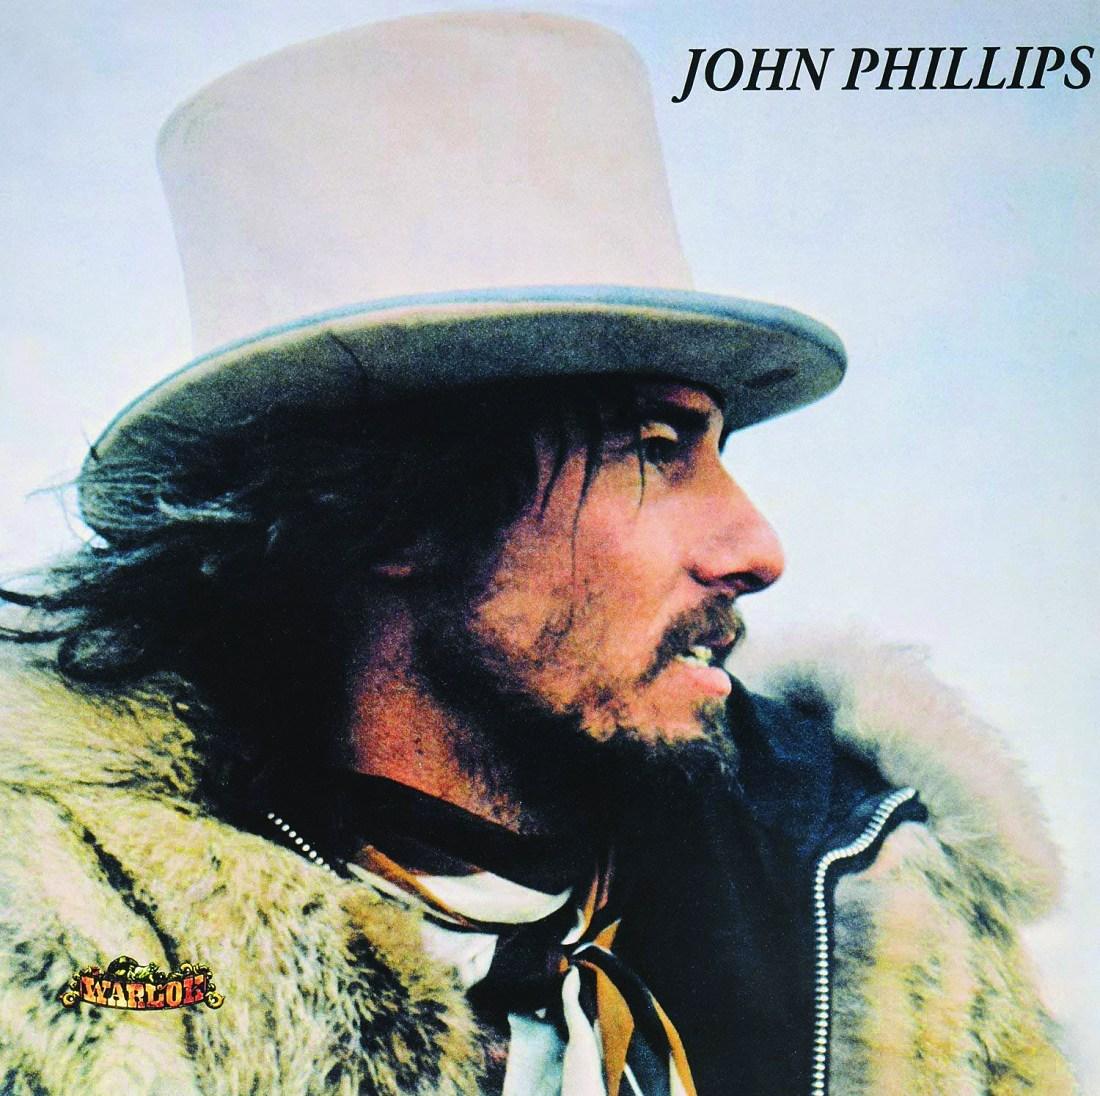 The Story Behind The Sleeve #20: John Phillips - John Phillips